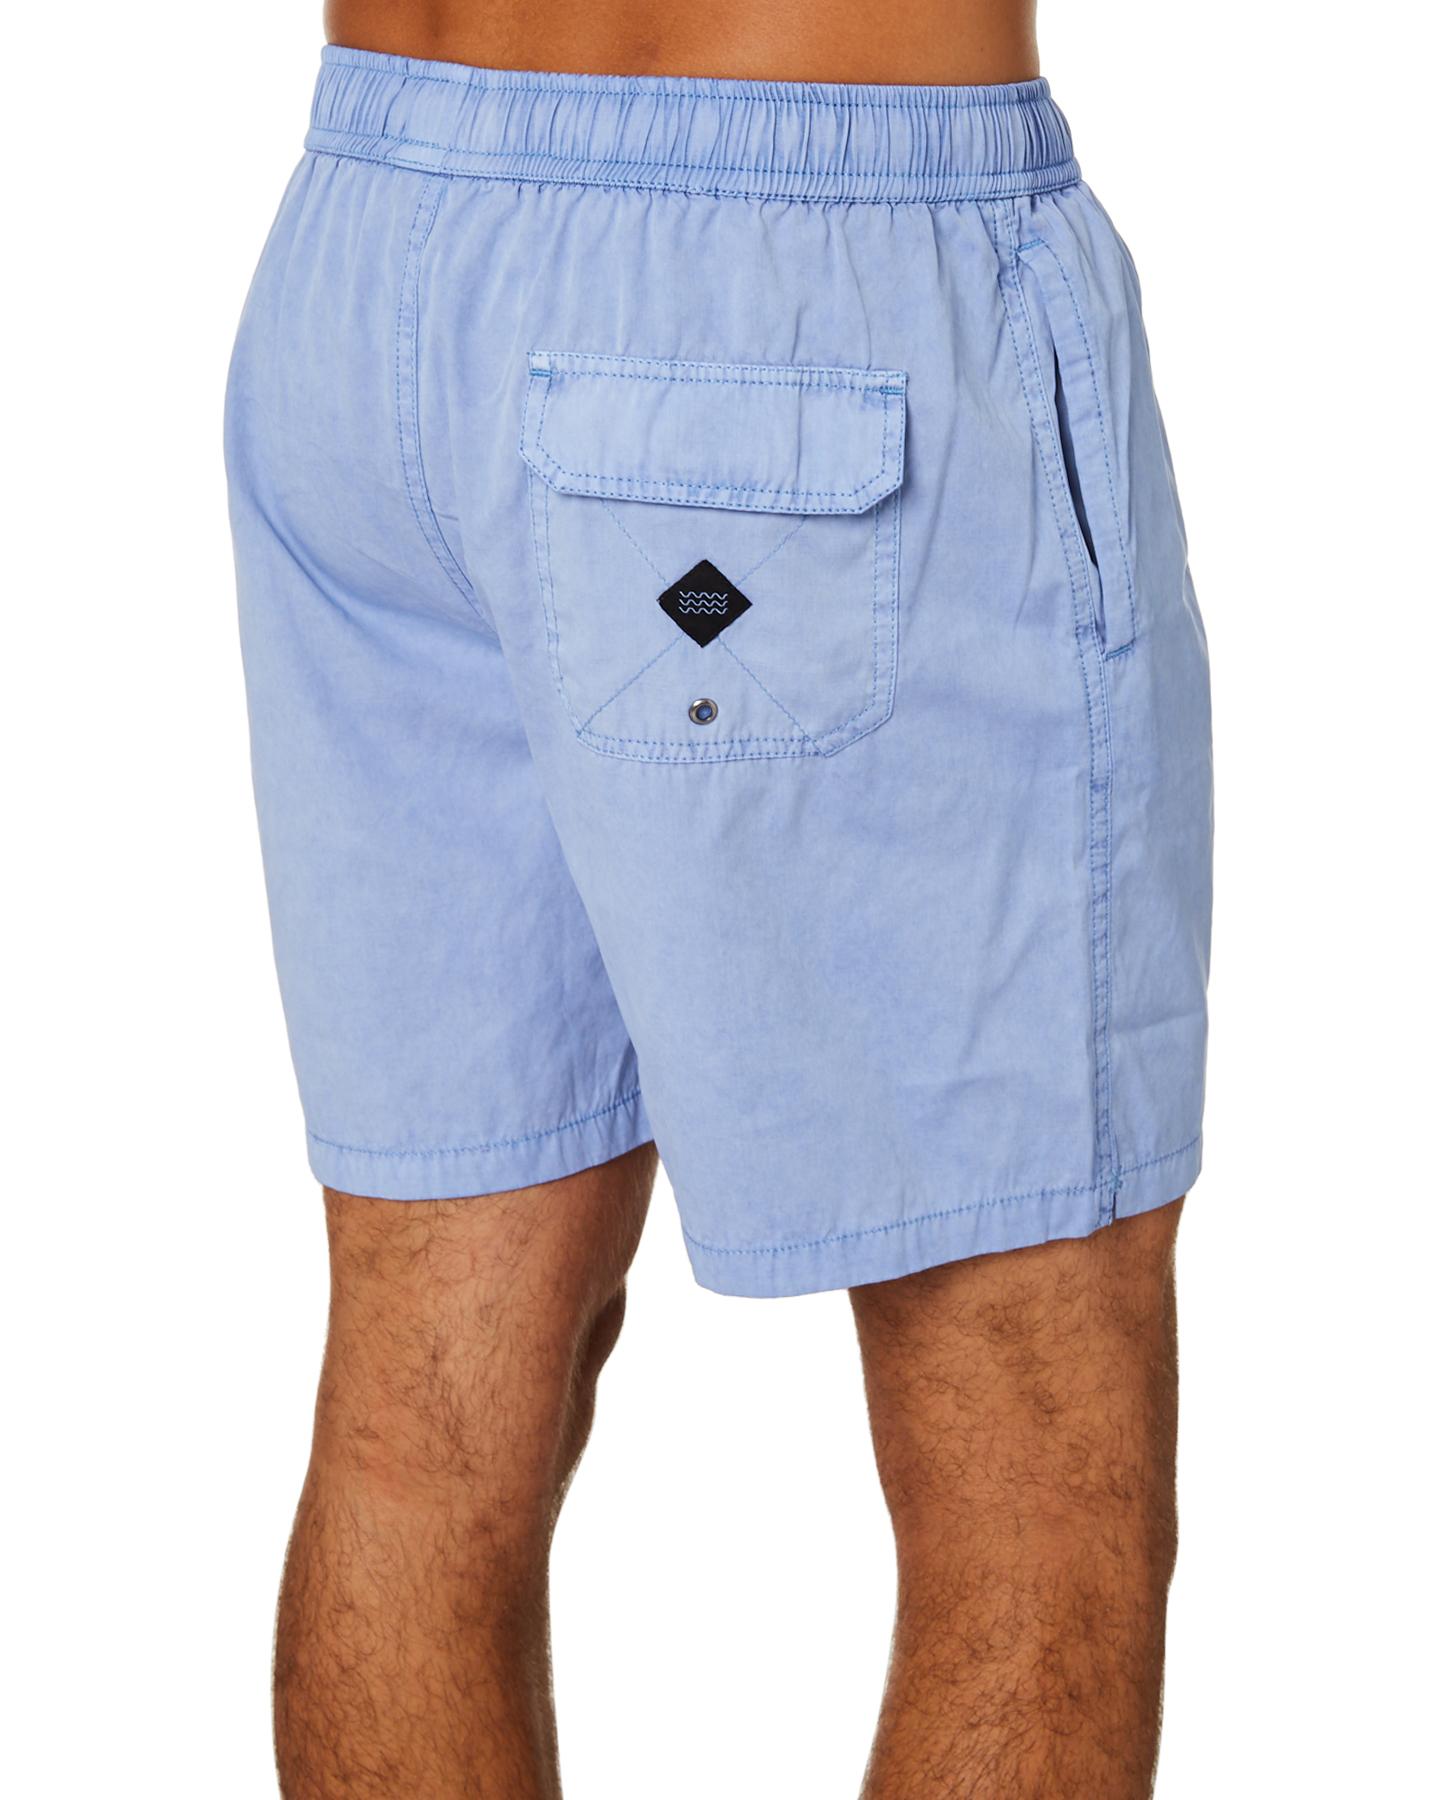 New-Swell-Men-039-s-Malibu-Mens-Beach-Short-Cotton-Polyester-Grey thumbnail 22